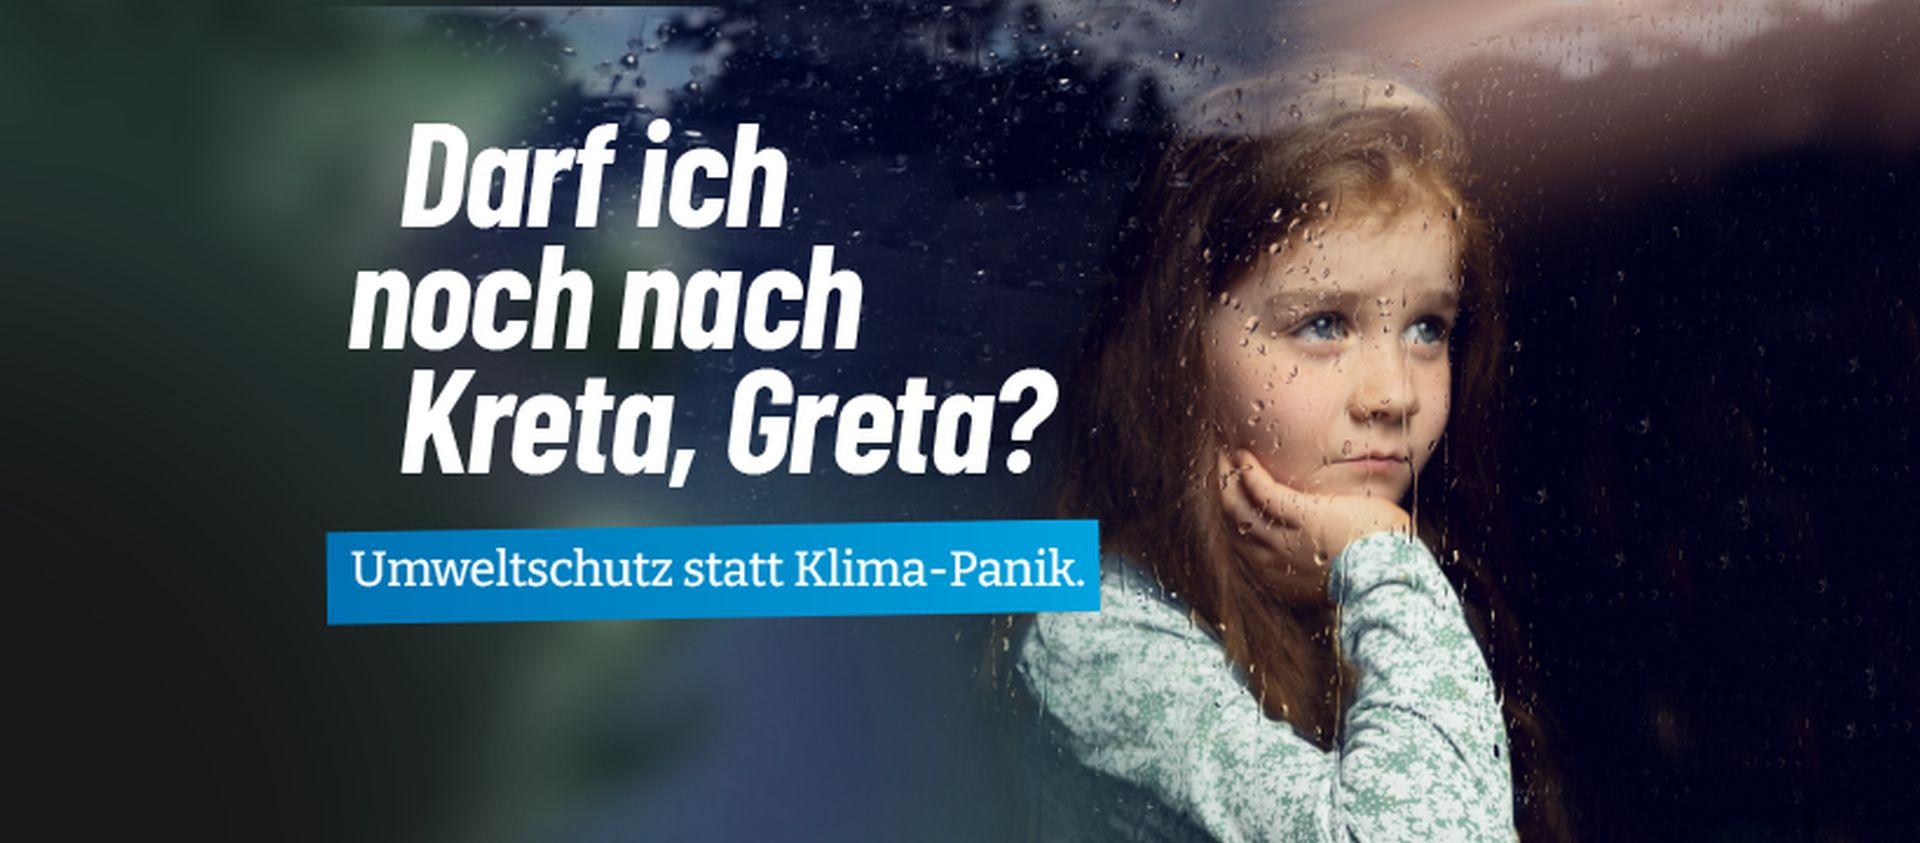 FB_Cover_Photo_Kampagne2_Umwelt